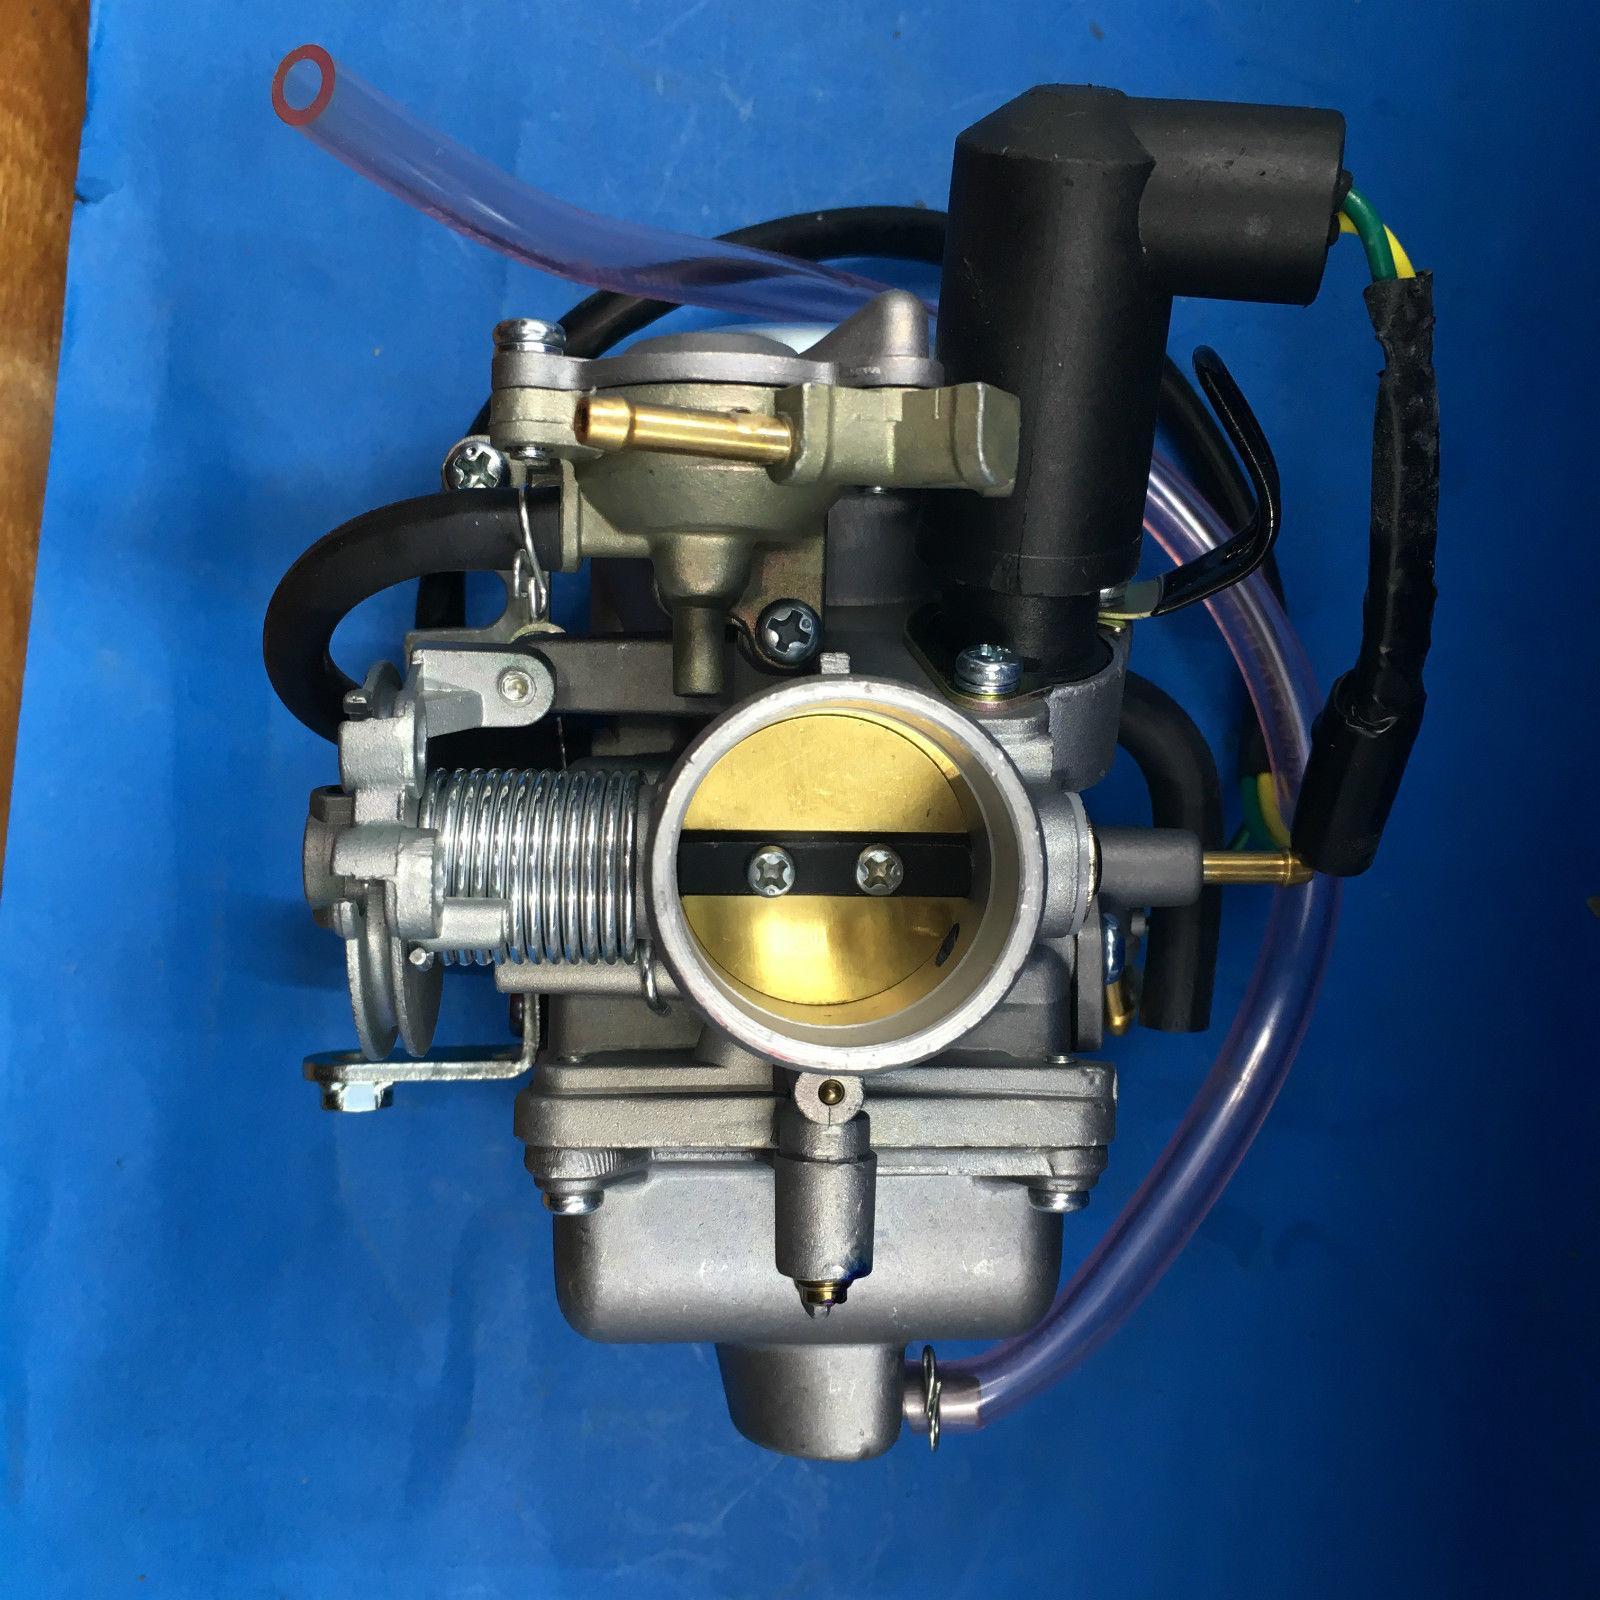 250cc Scooter Moped Motor 30mm Karbüratör Carb Bölüm İçin Honda CN250 CF250 Helix